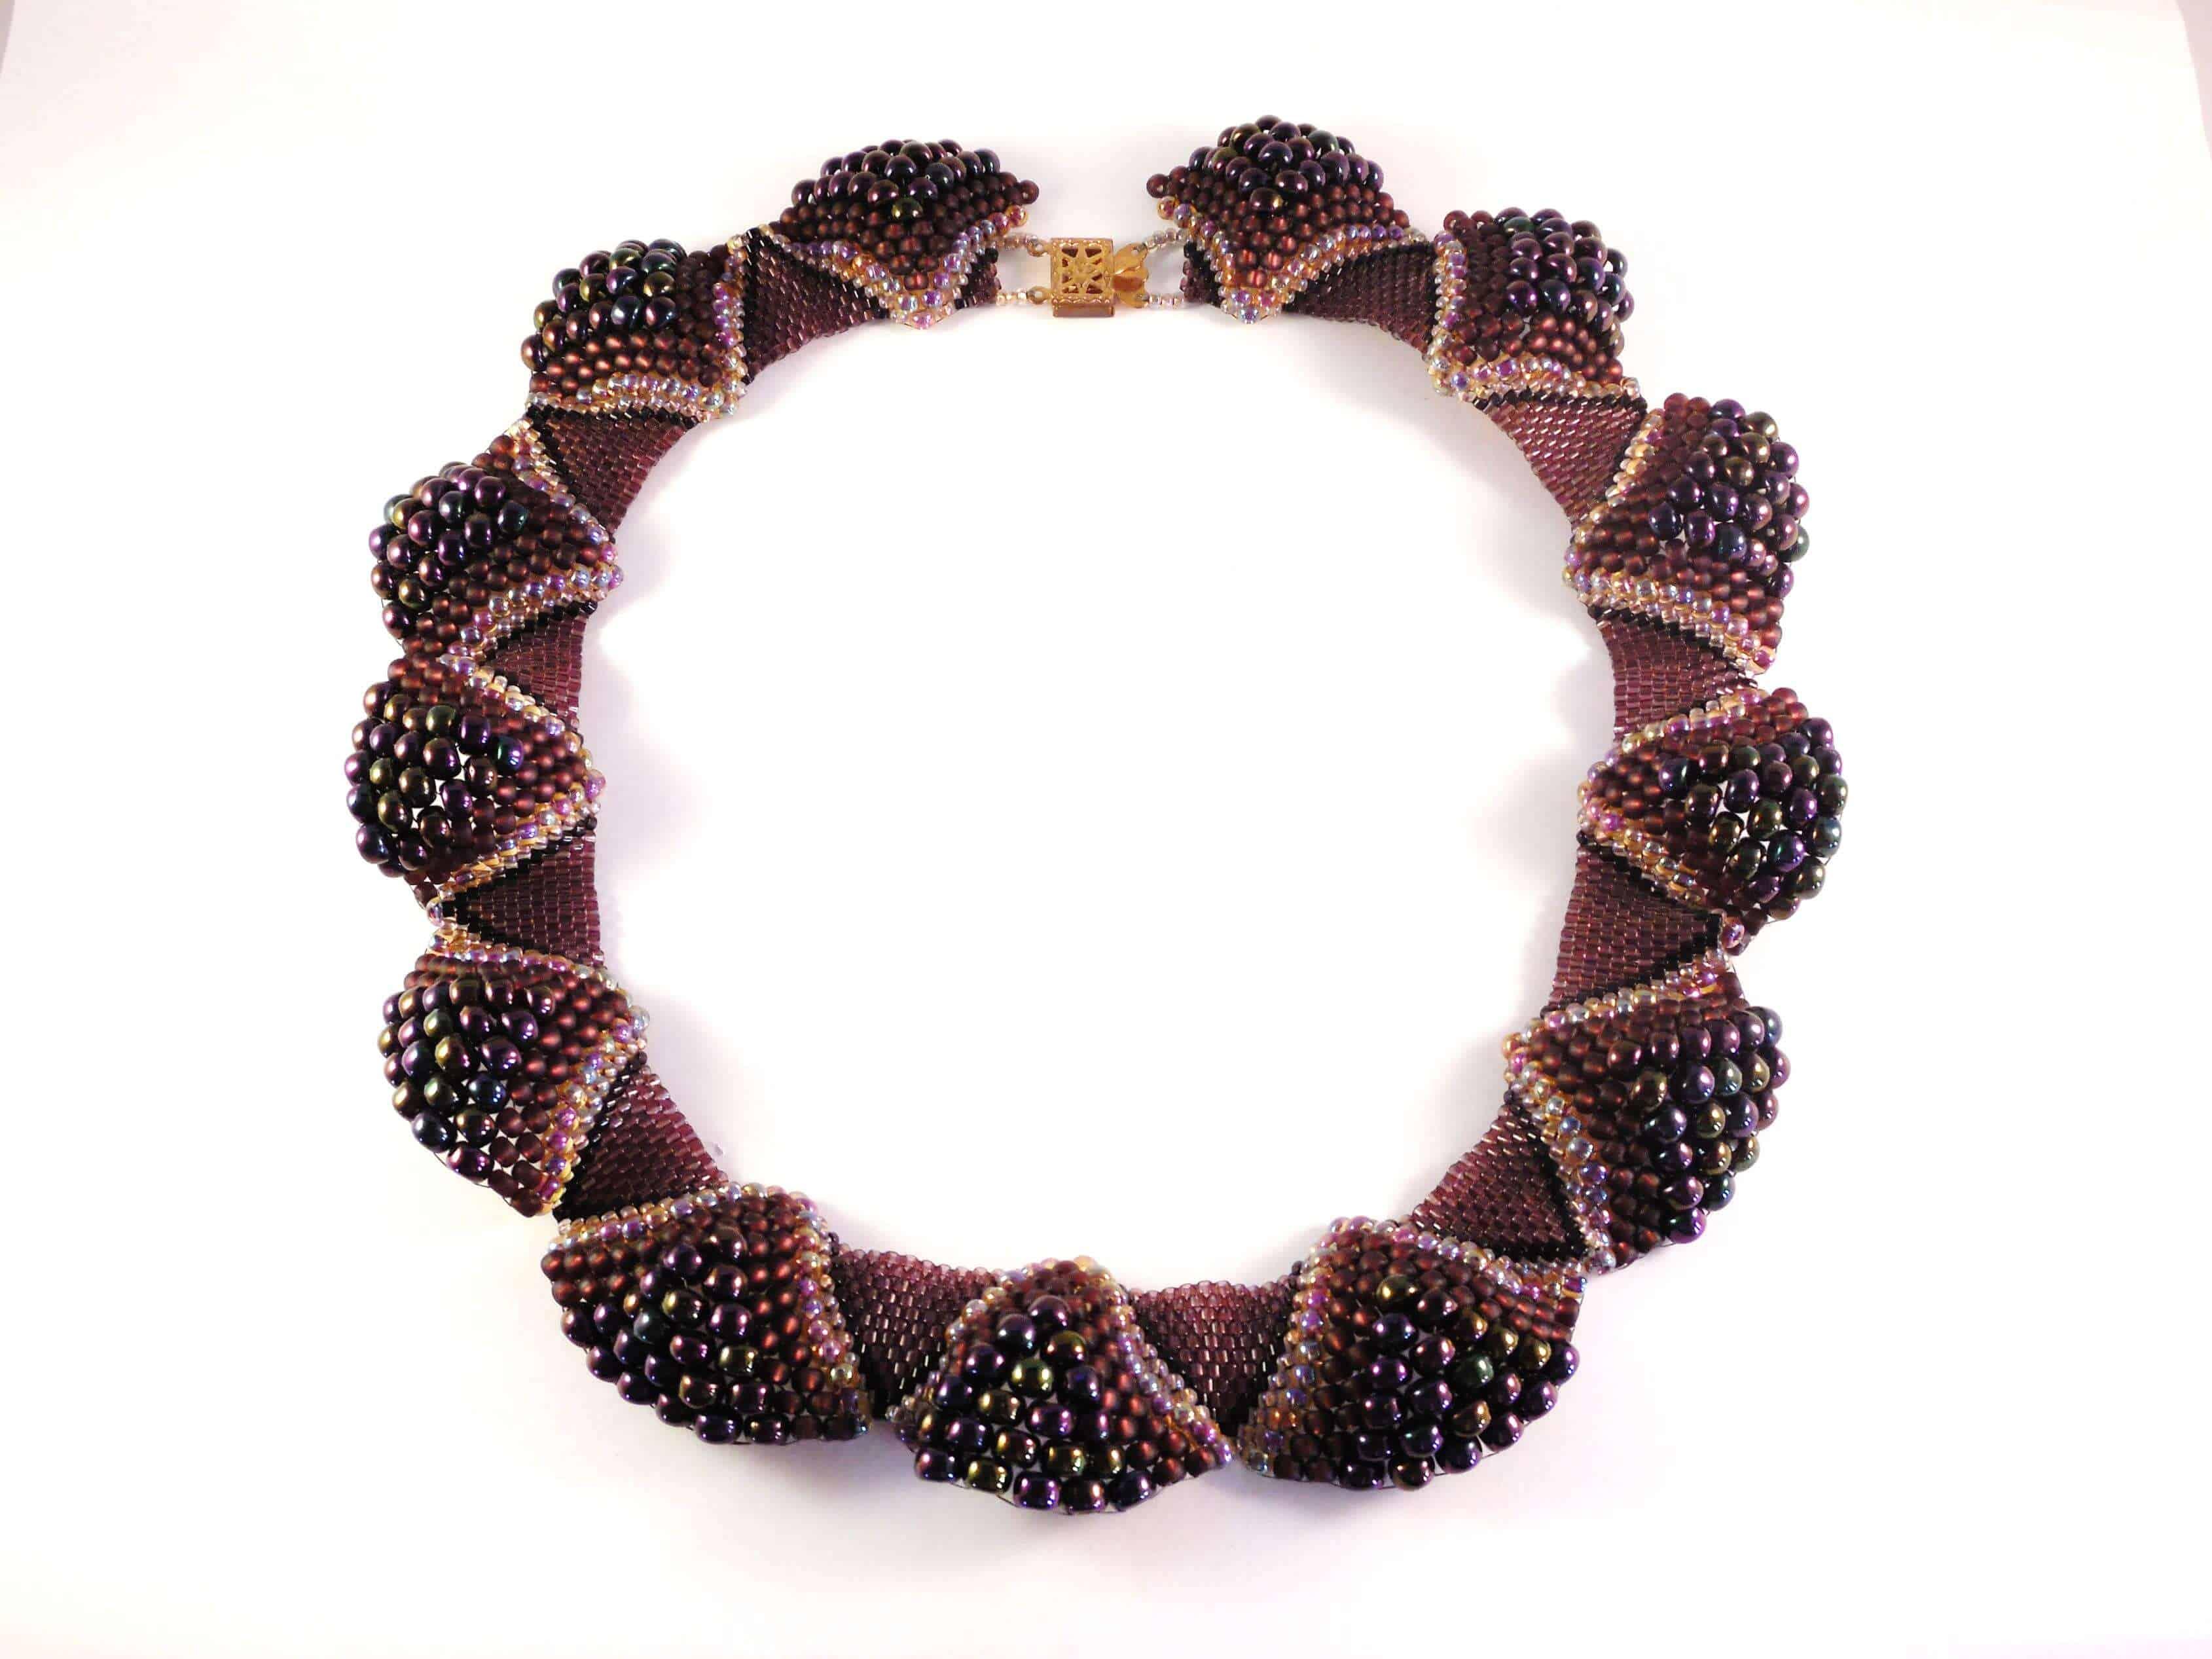 Ruffled Collar Beading Pattern- The Bead Club Lounge